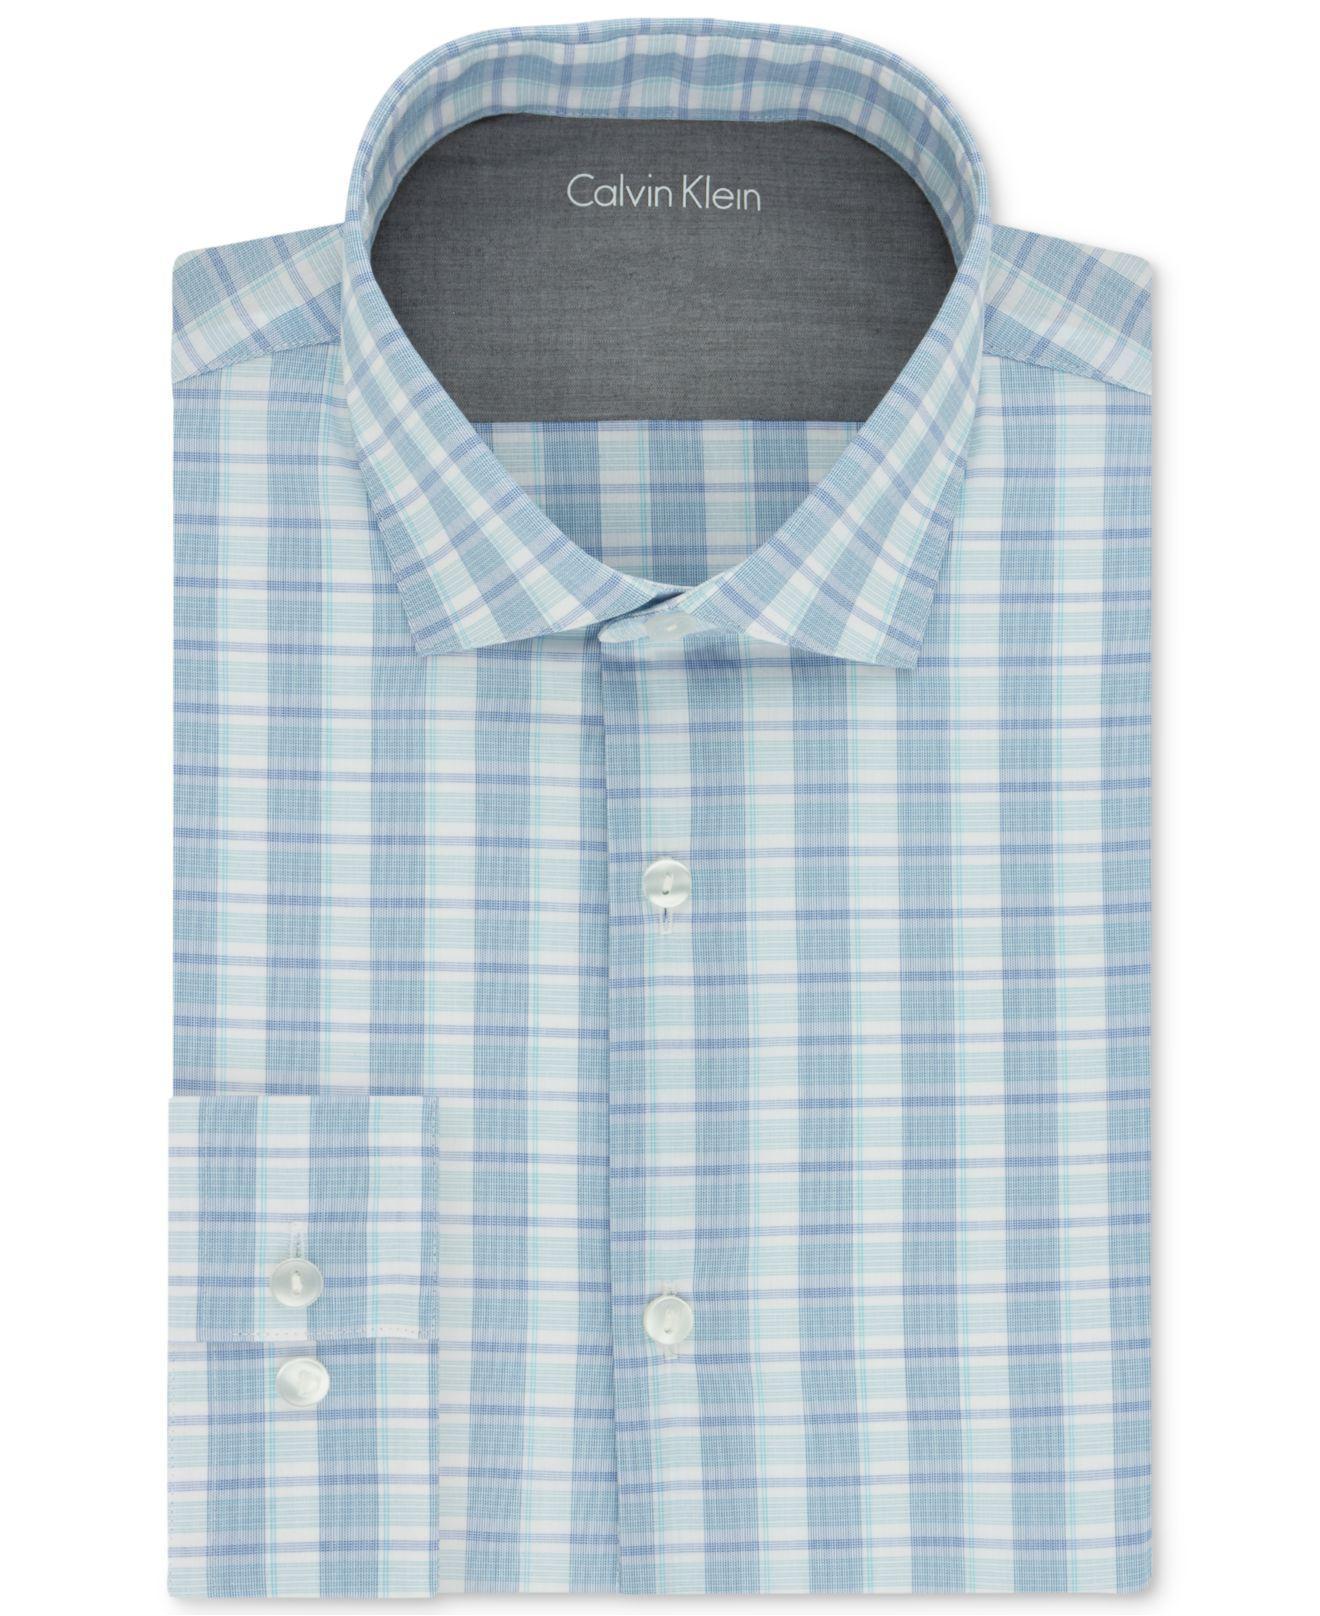 315c4e32887a Mens Extra Slim Fit Dress Shirts - Cotswold Hire